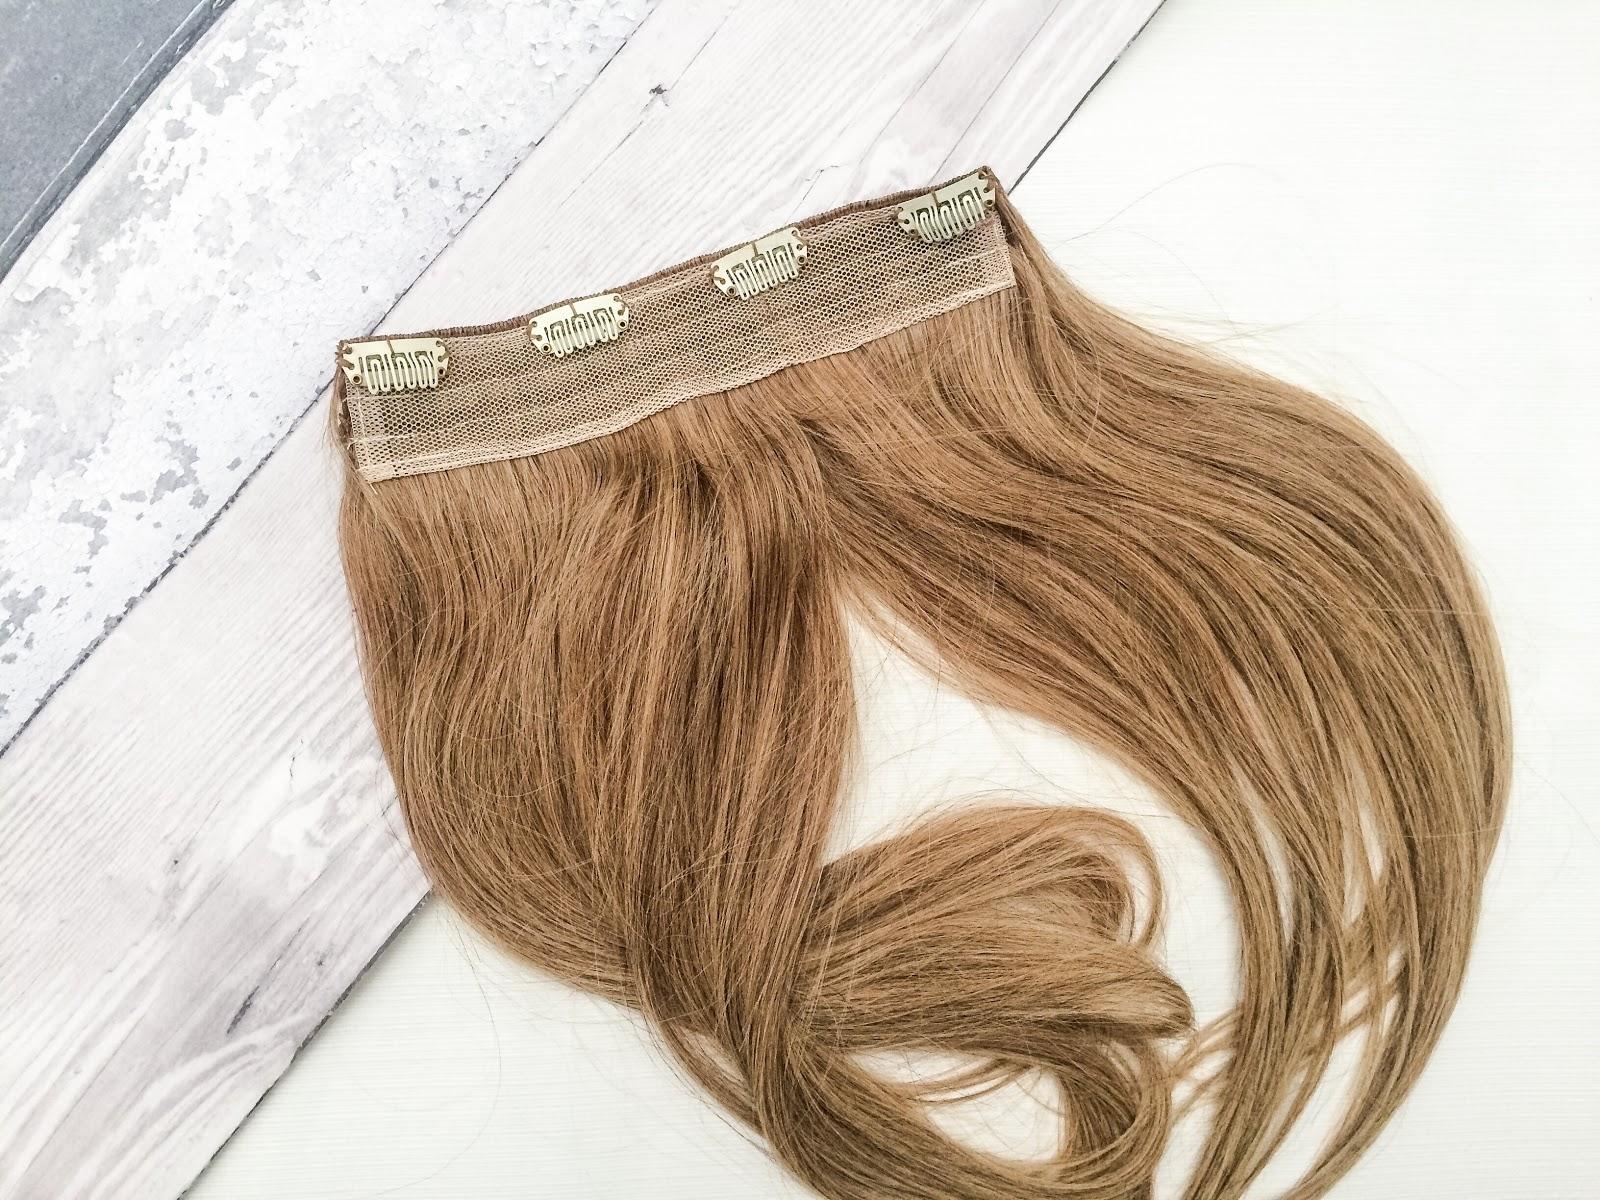 Irresistible Me Hair Extensions Mascara And Maltesers Uk Beauty Blog